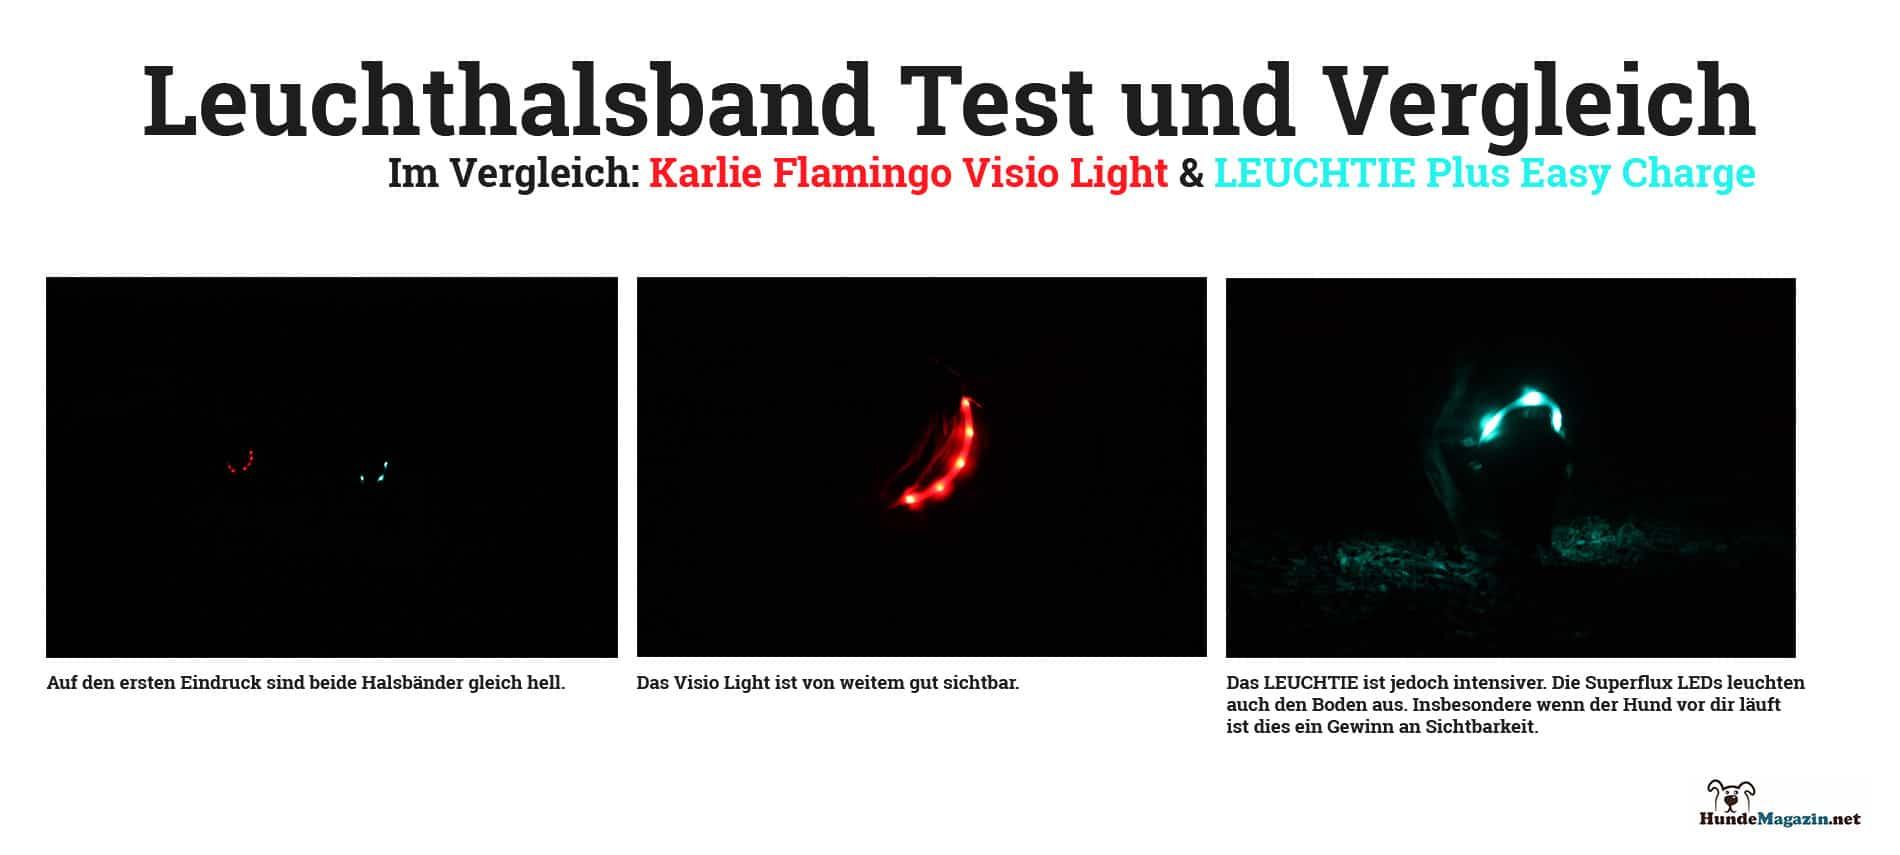 leuchthalbsband-test